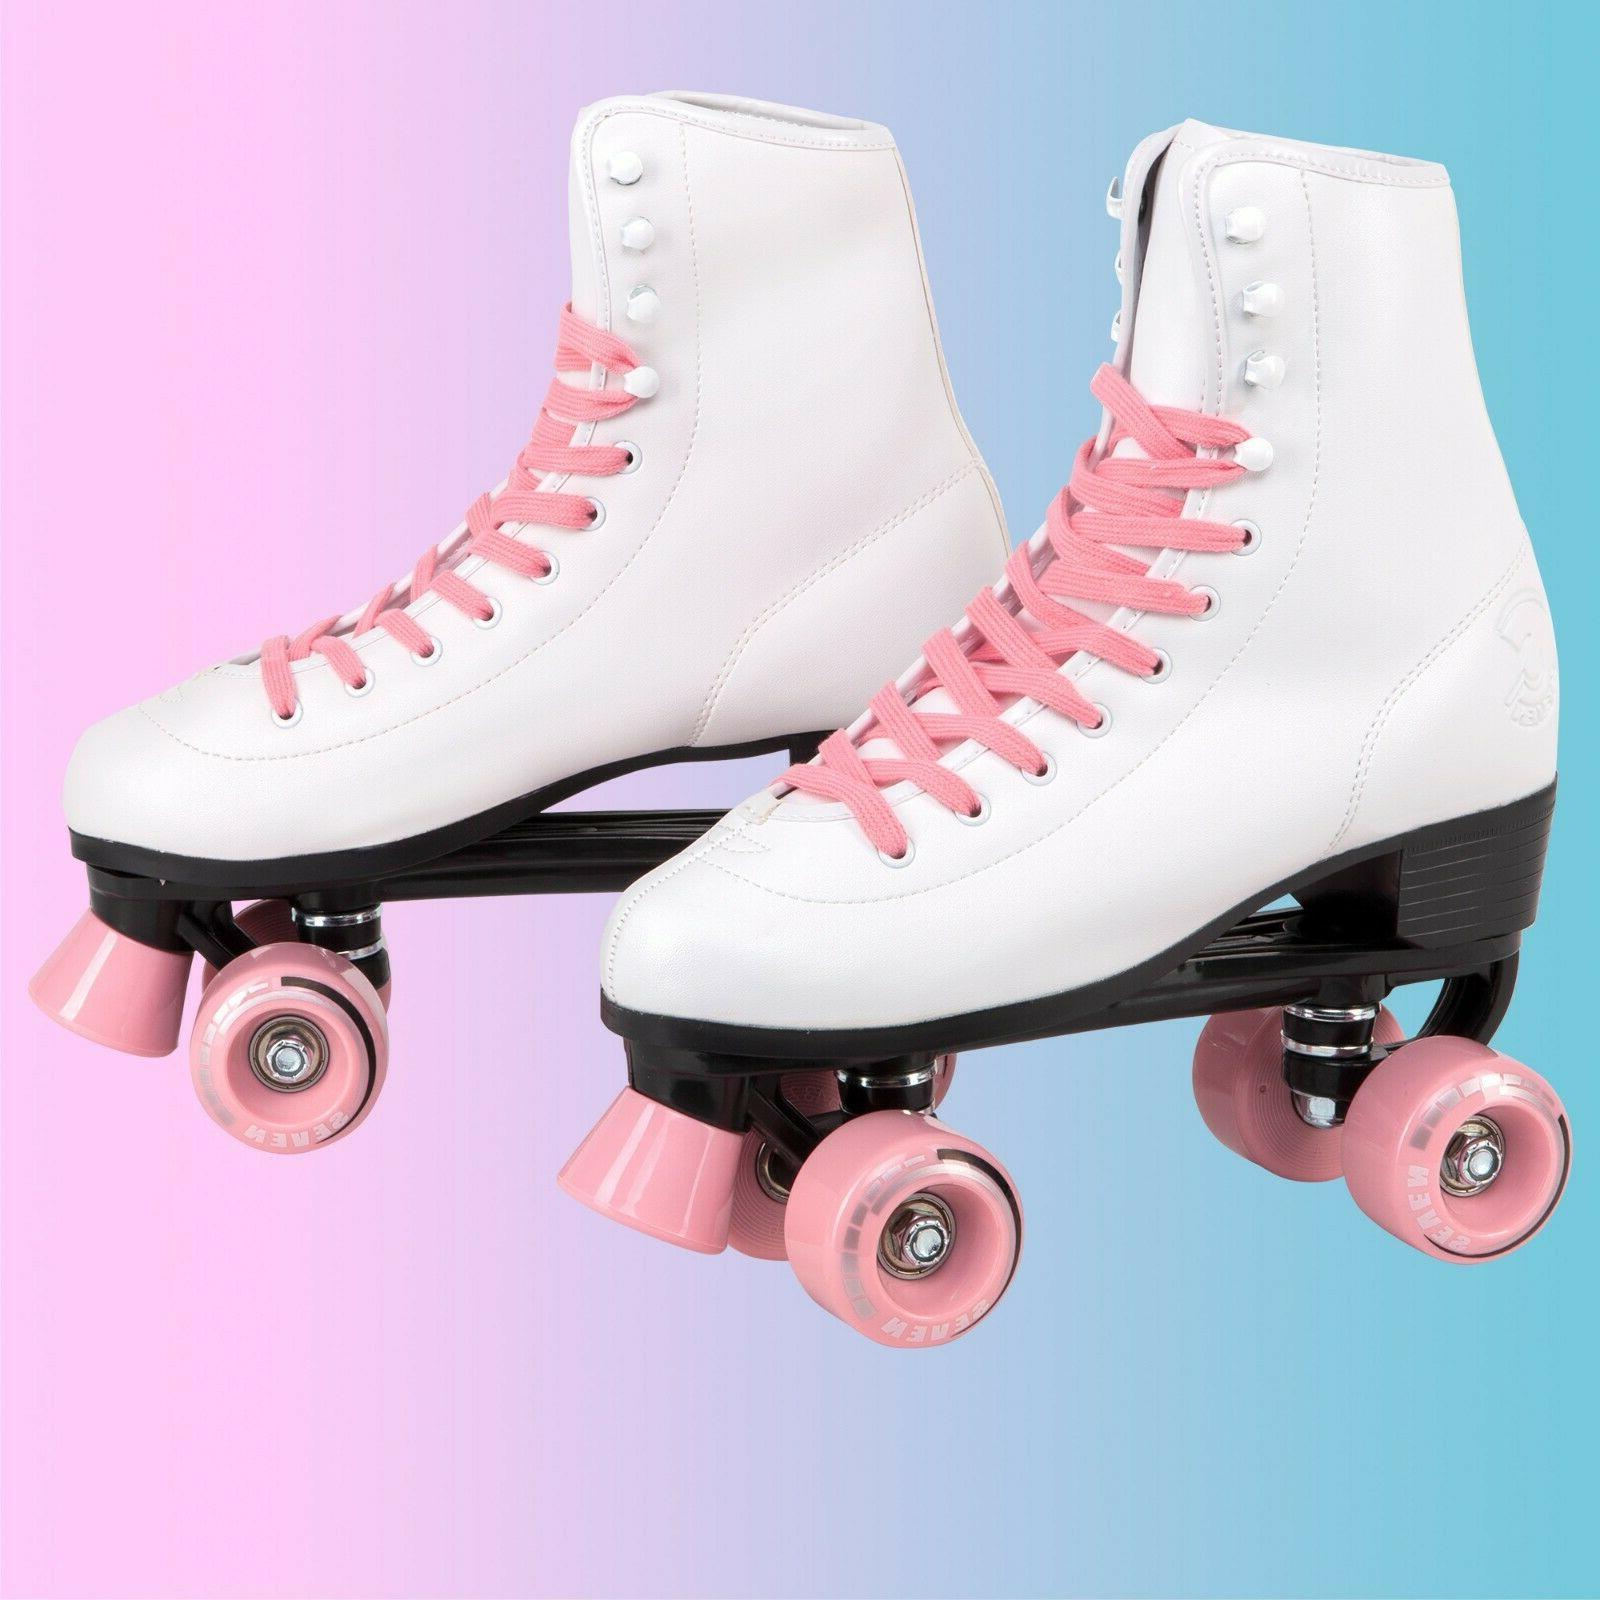 C7skates Leather Roller Skates, Gifts for Girls